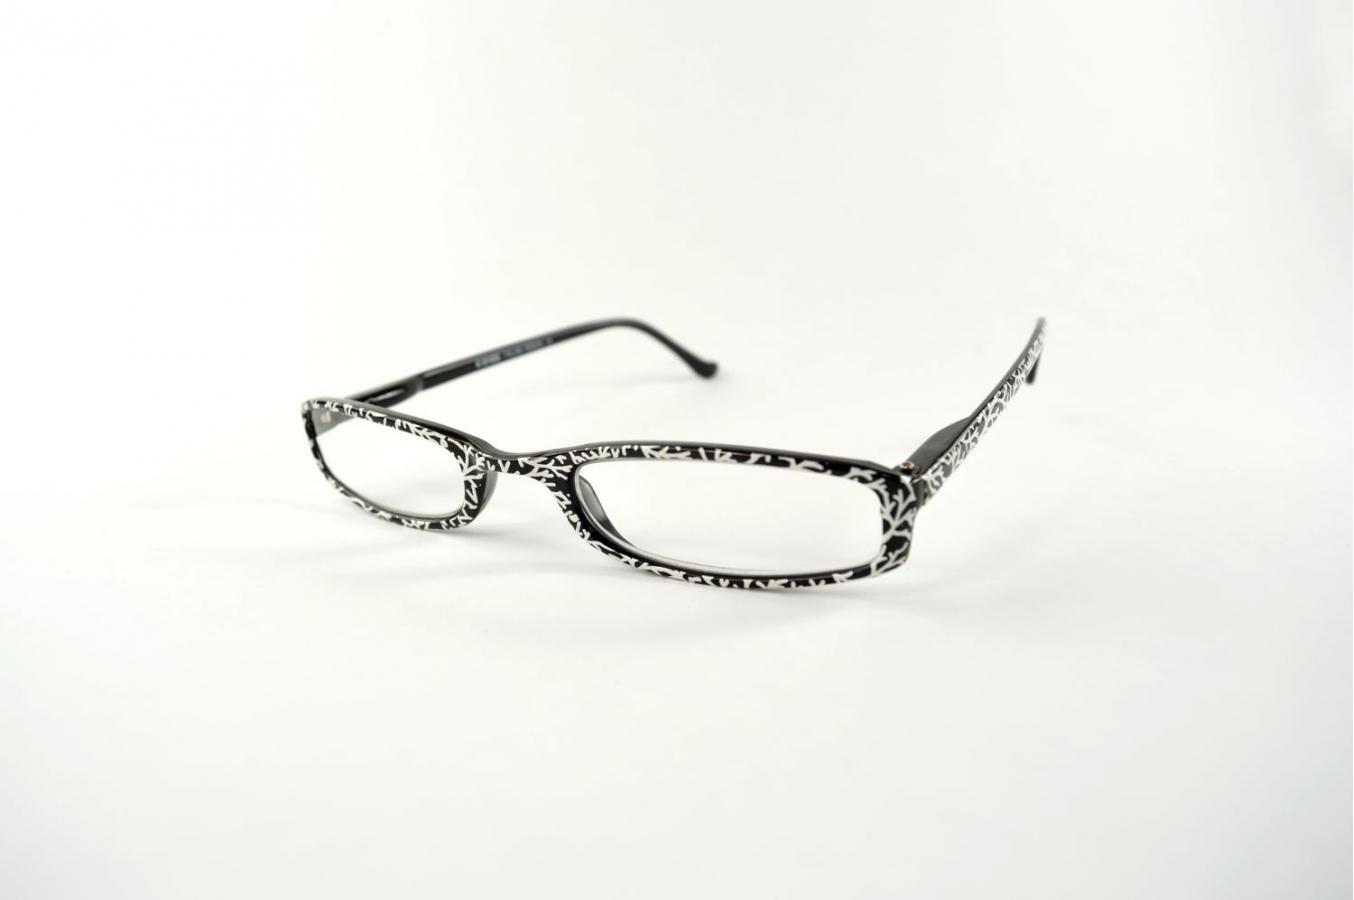 b87ff9adc053 Lunettes De Lecture Reading Glasses